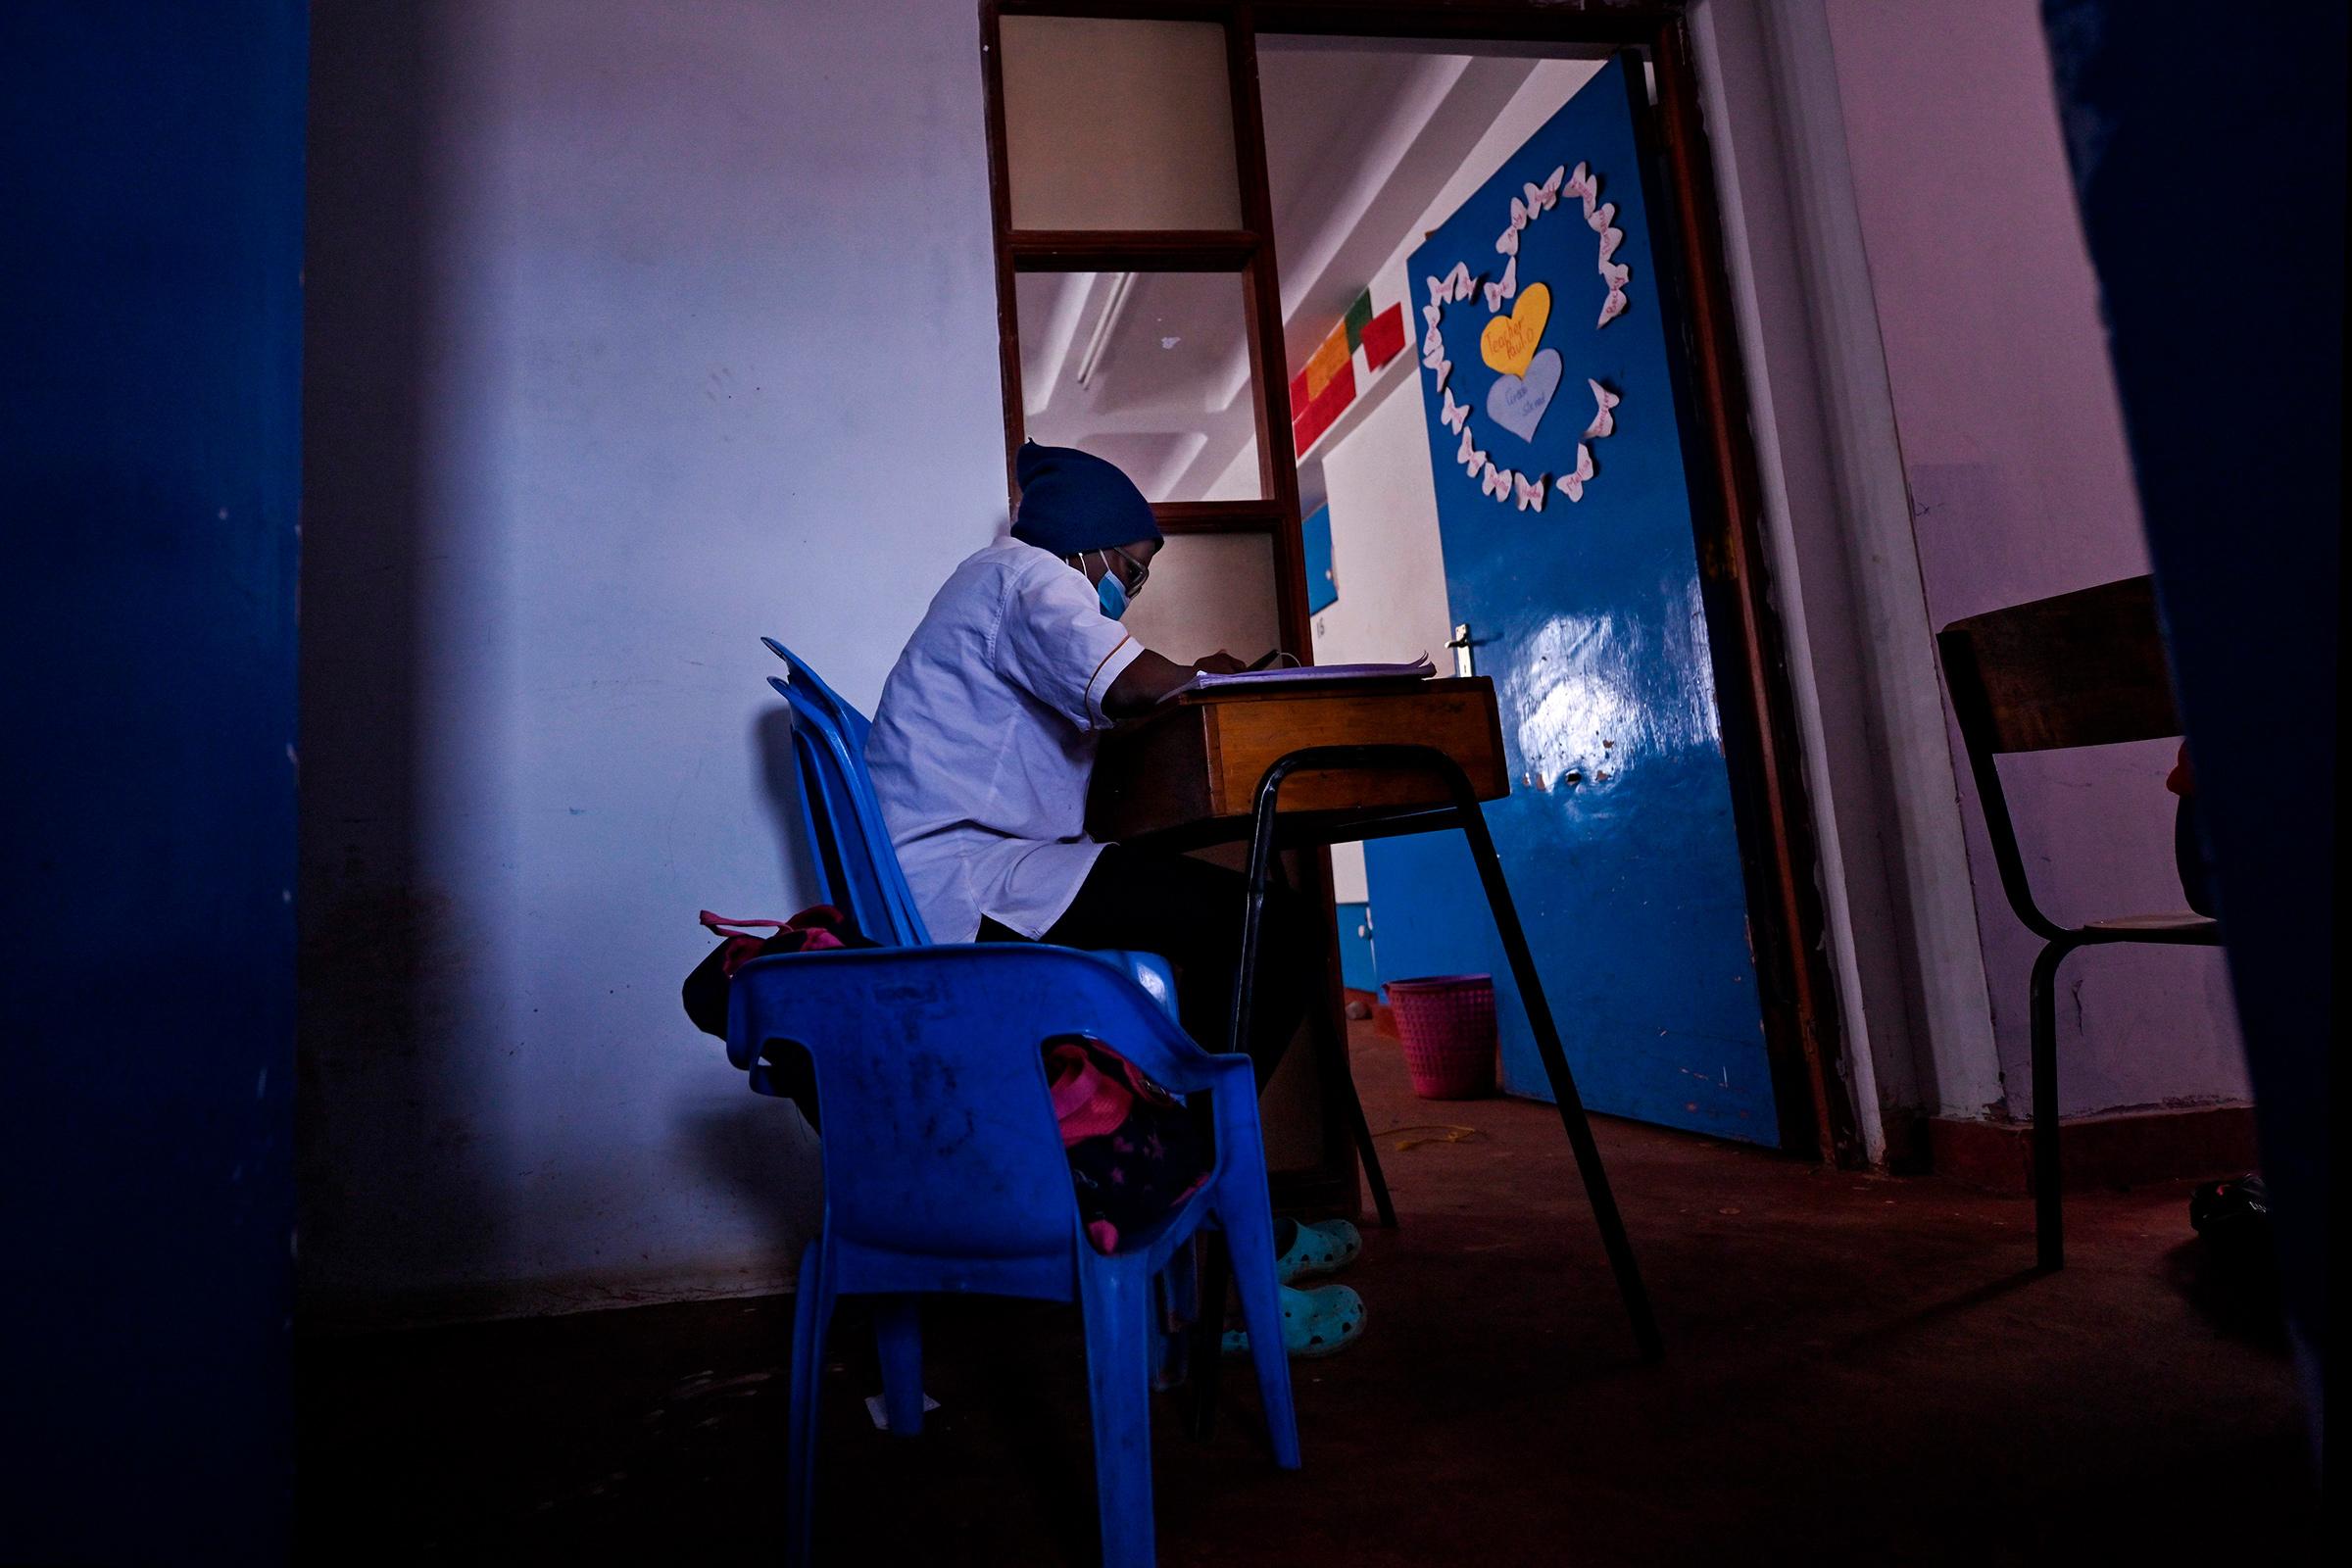 A student sits at her desk at Kibera School for Girls in Kibera, Nairobi, kenya, on Aug. 7, 2020.